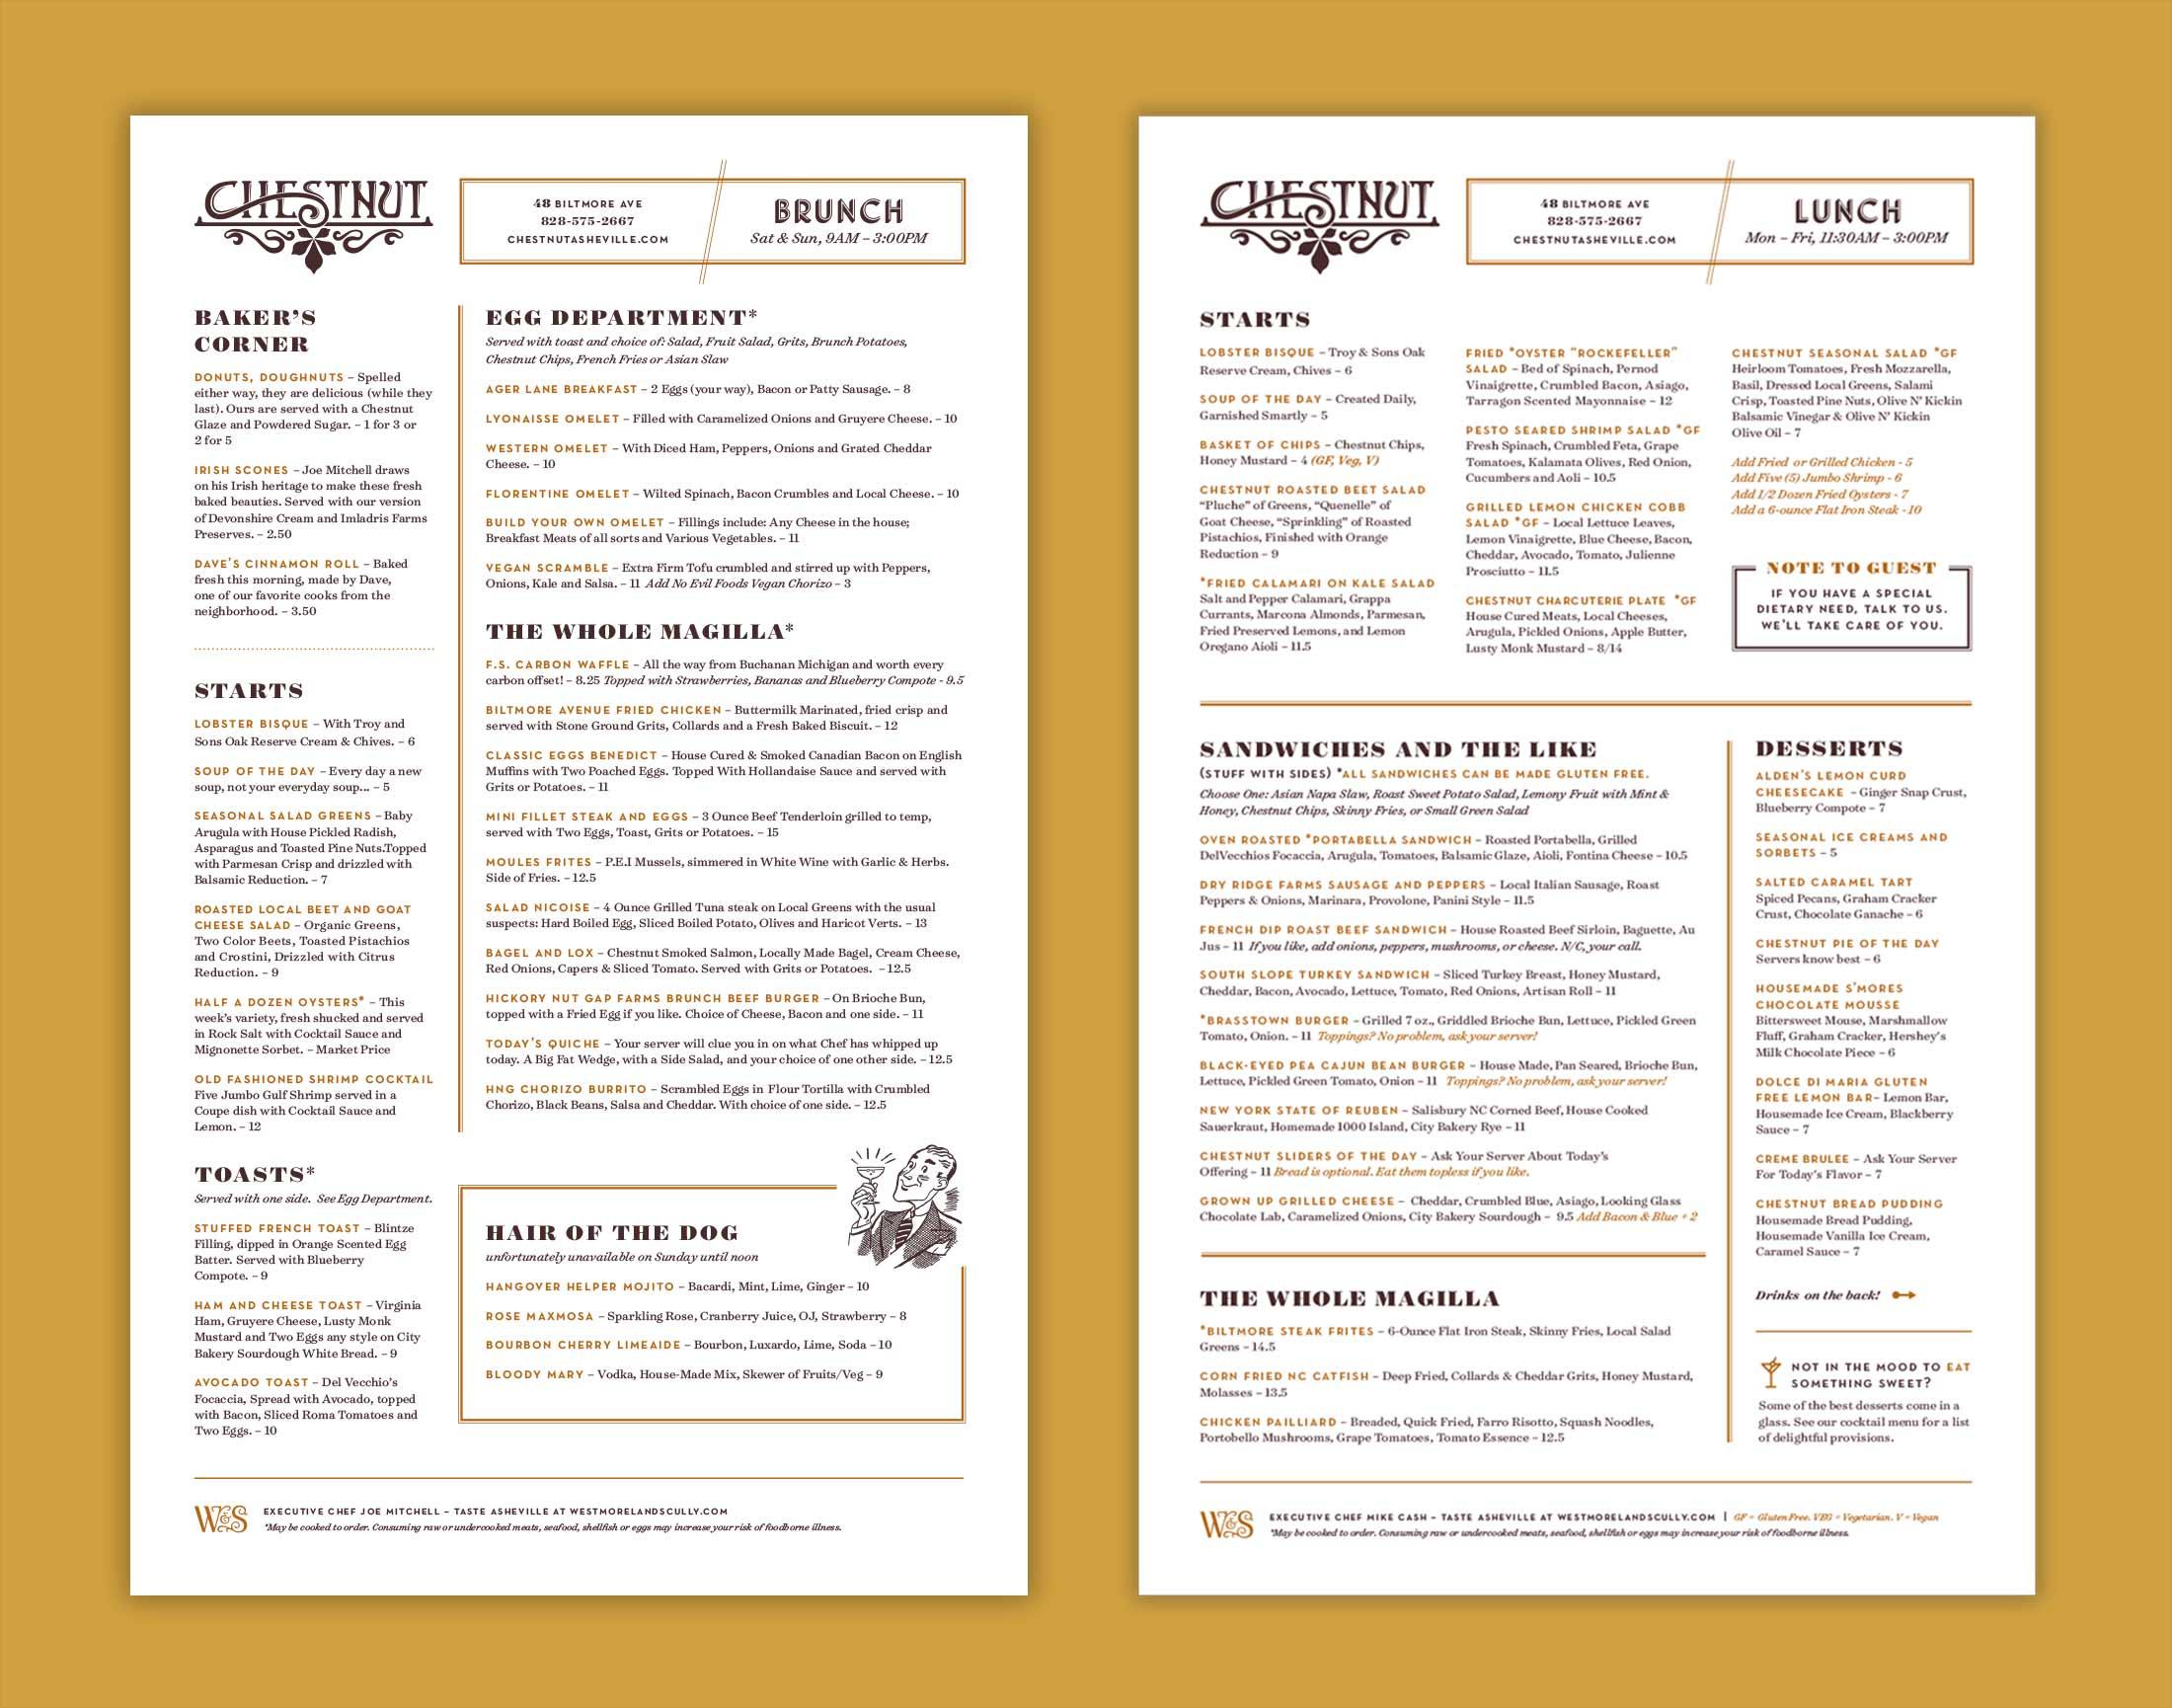 Chestnut menu design